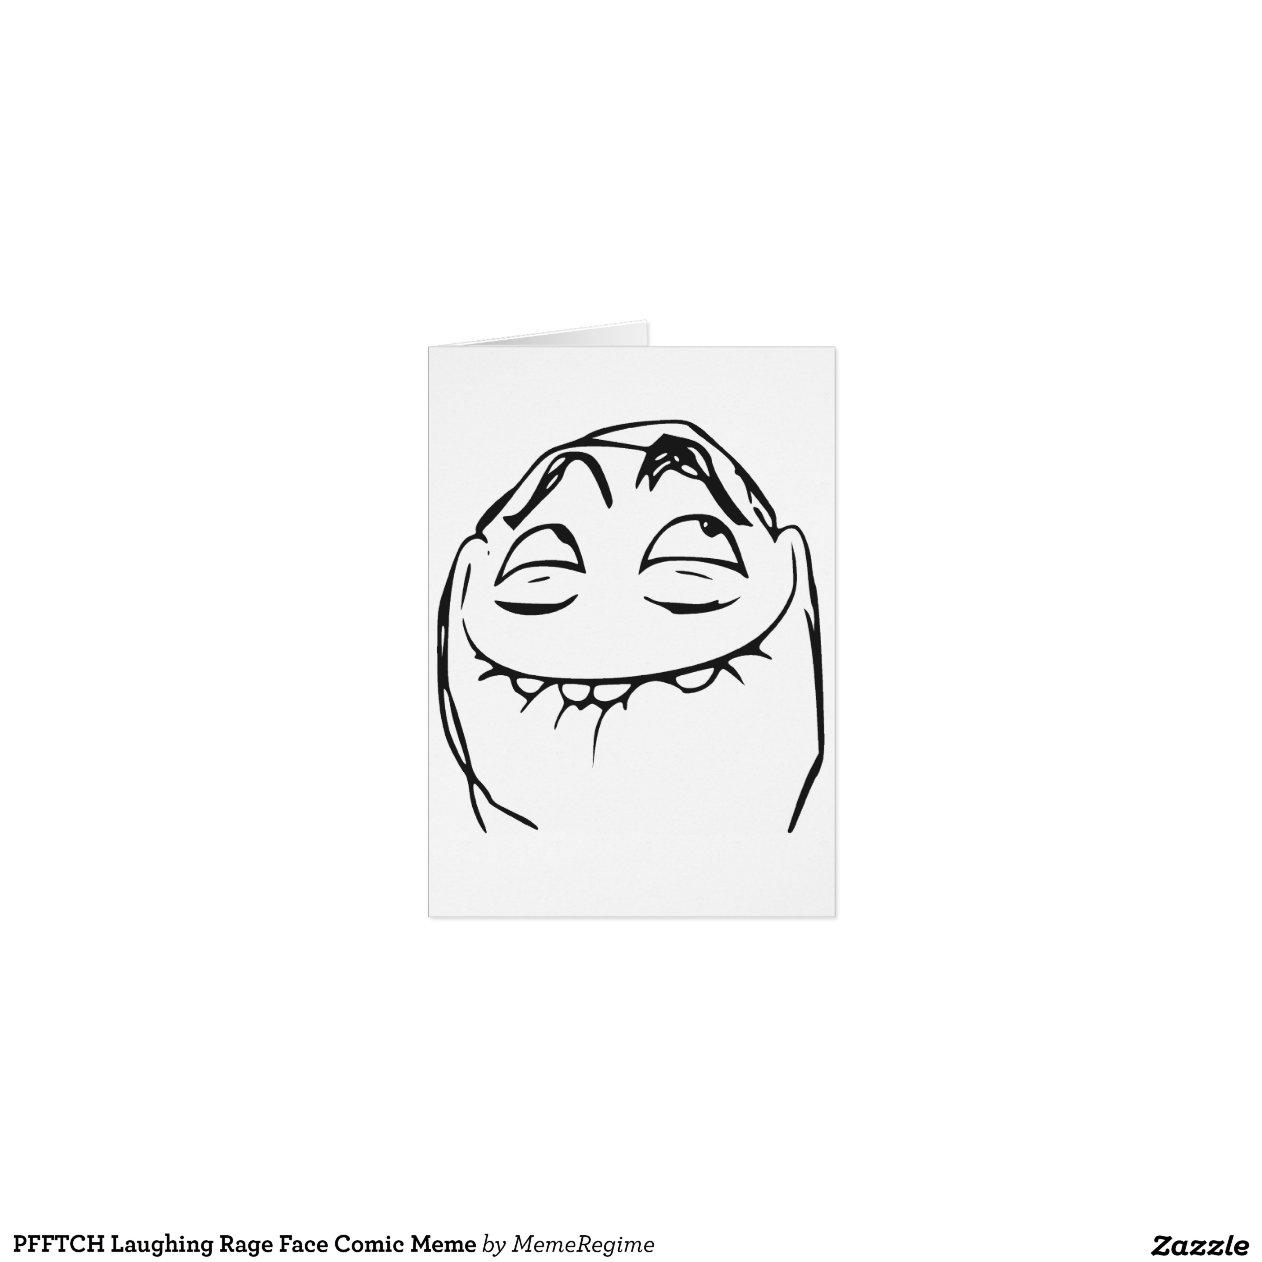 laughing face meme - photo #10